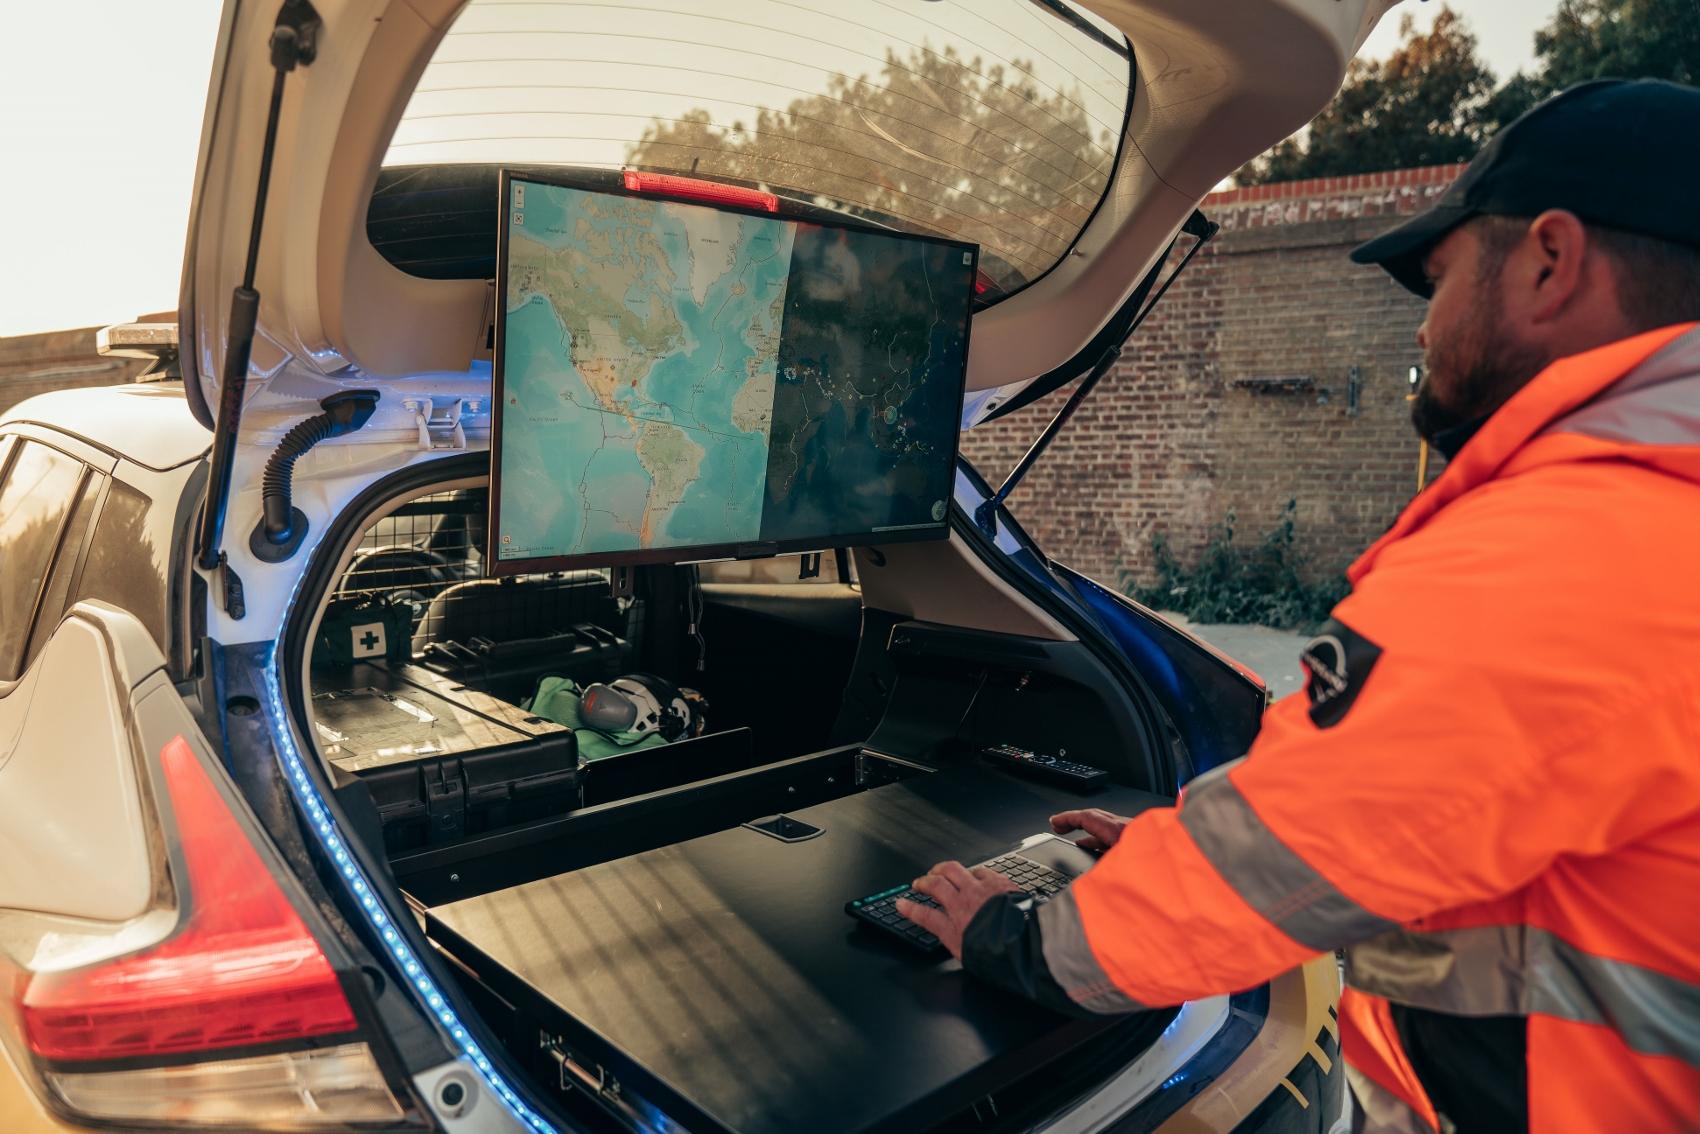 Nissan RE-Leaf je určený na zásahy po katastrofách LWgQMoHJPm nissanre-leaf4-1700x1134